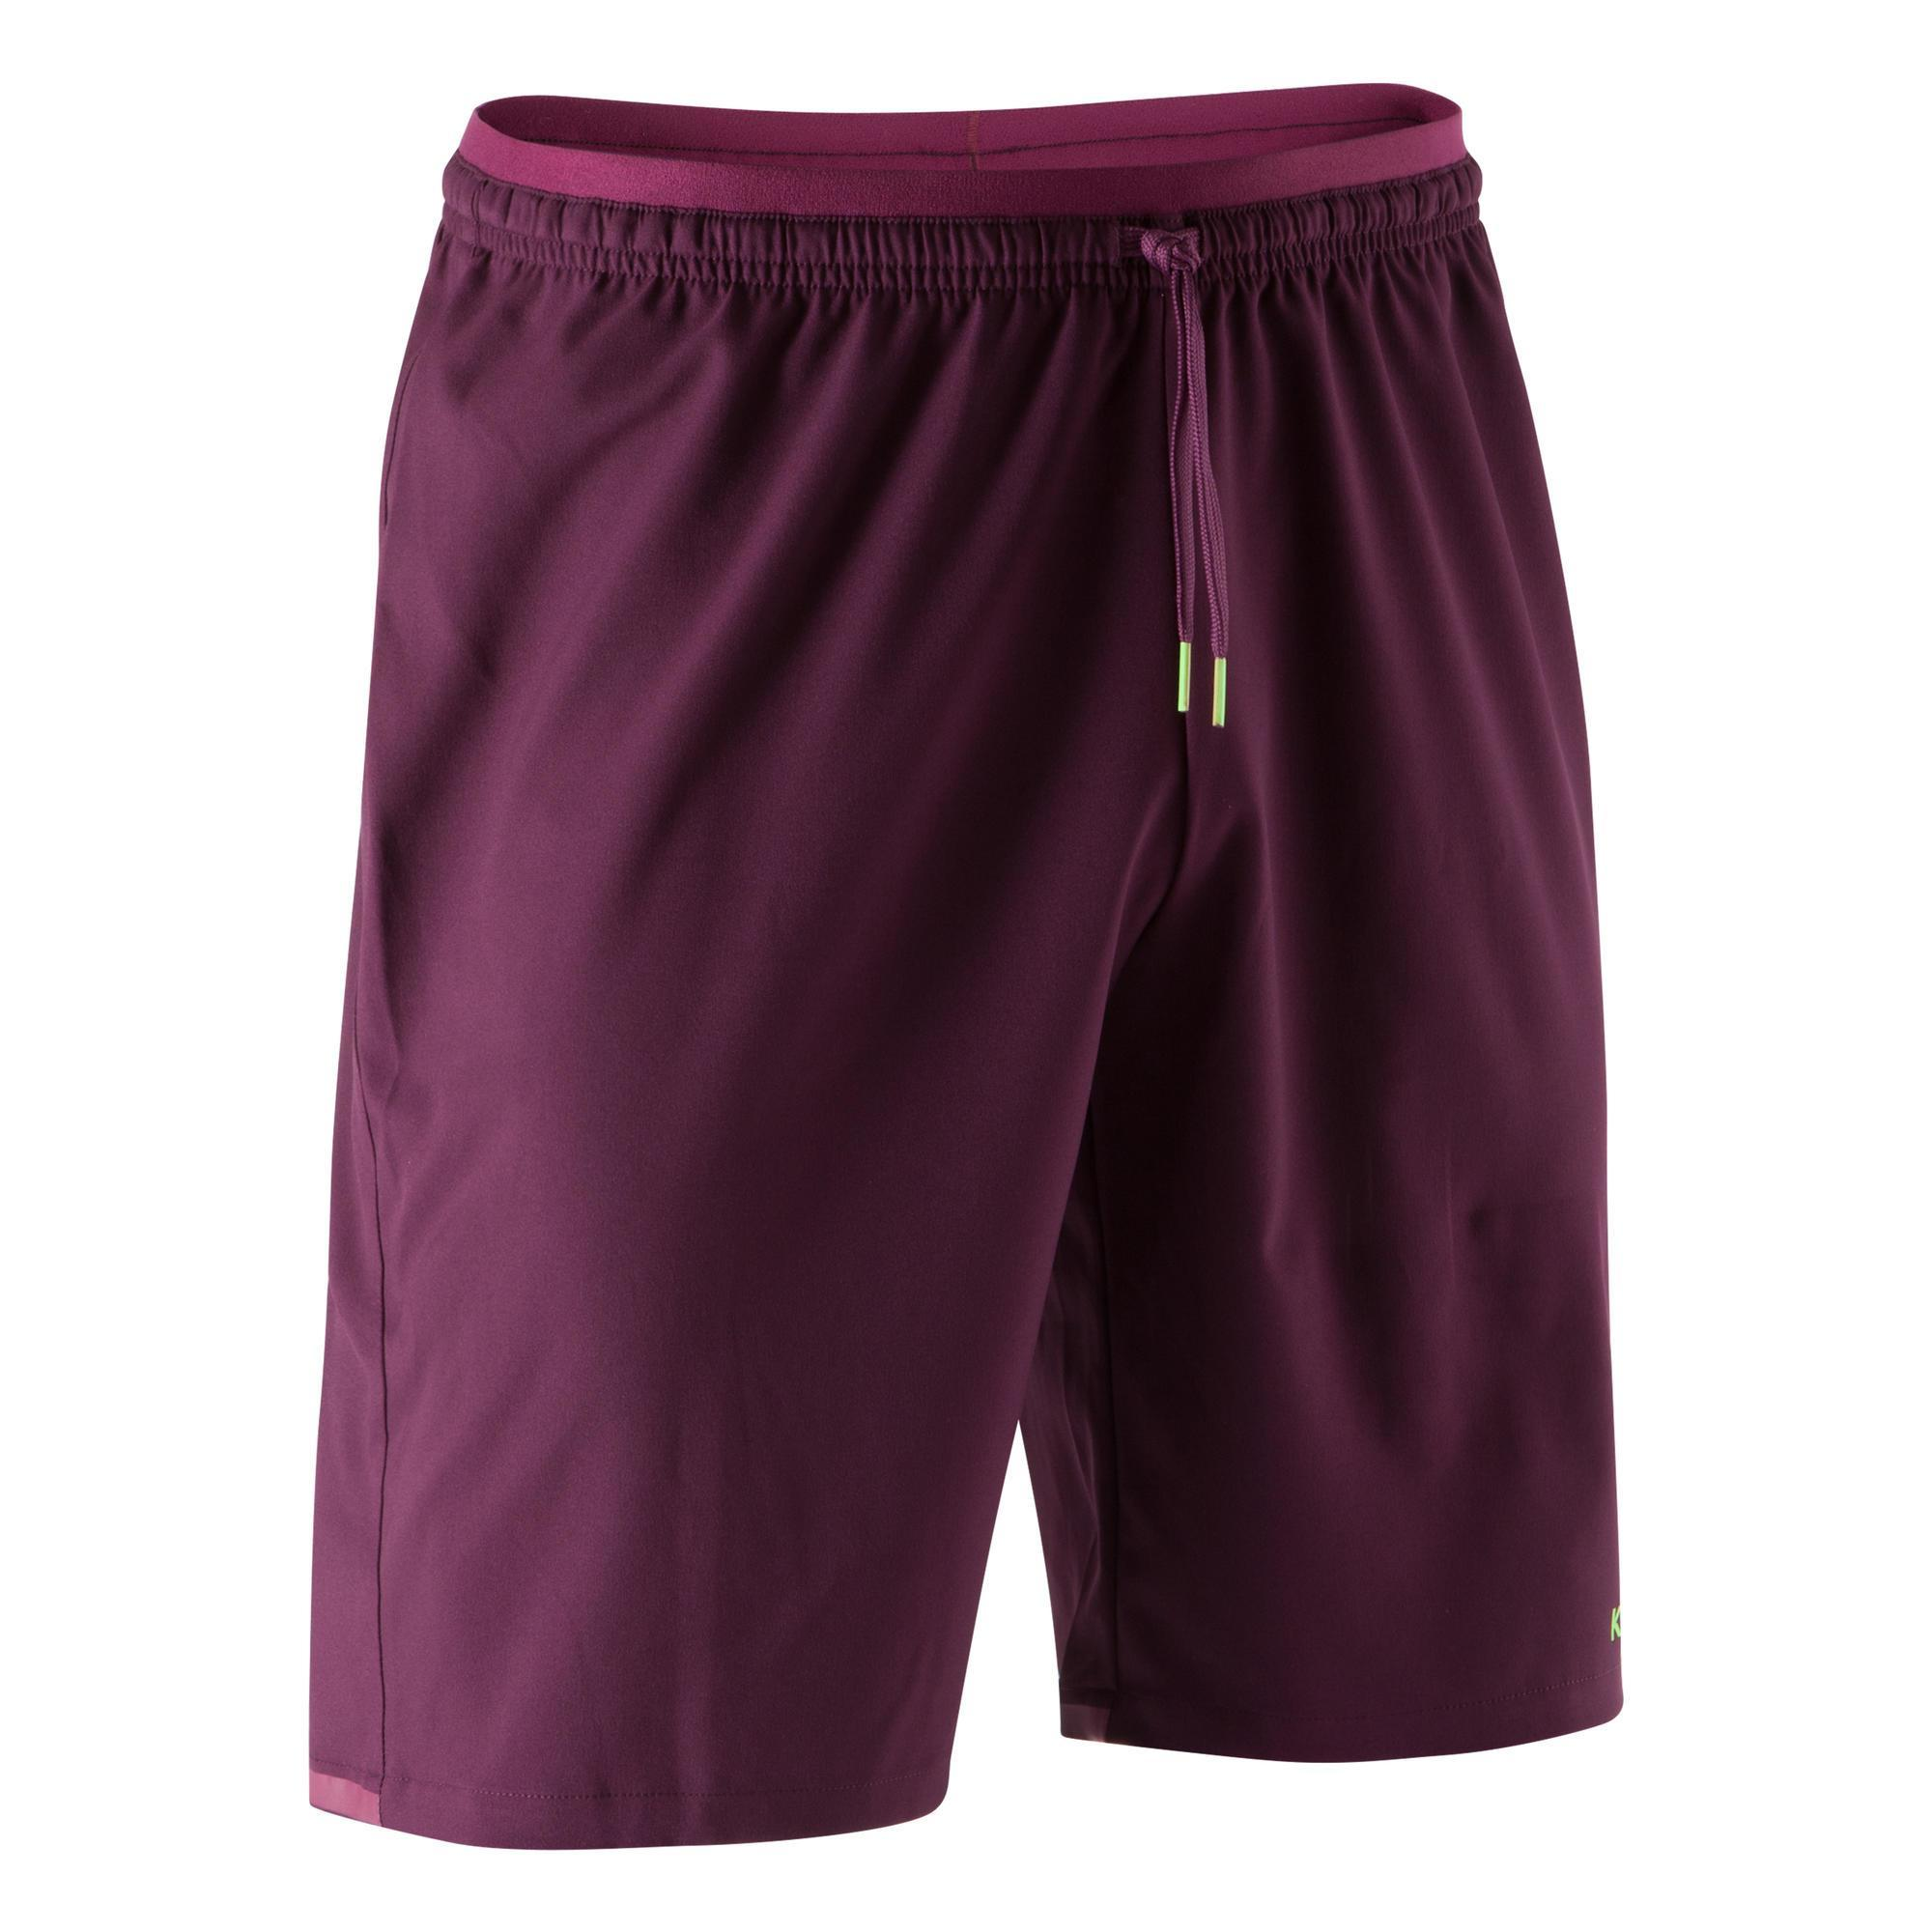 Torwarthose kurz F500 Erwachsene violett | Sportbekleidung > Sporthosen > Fahrradhosen | Kipsta